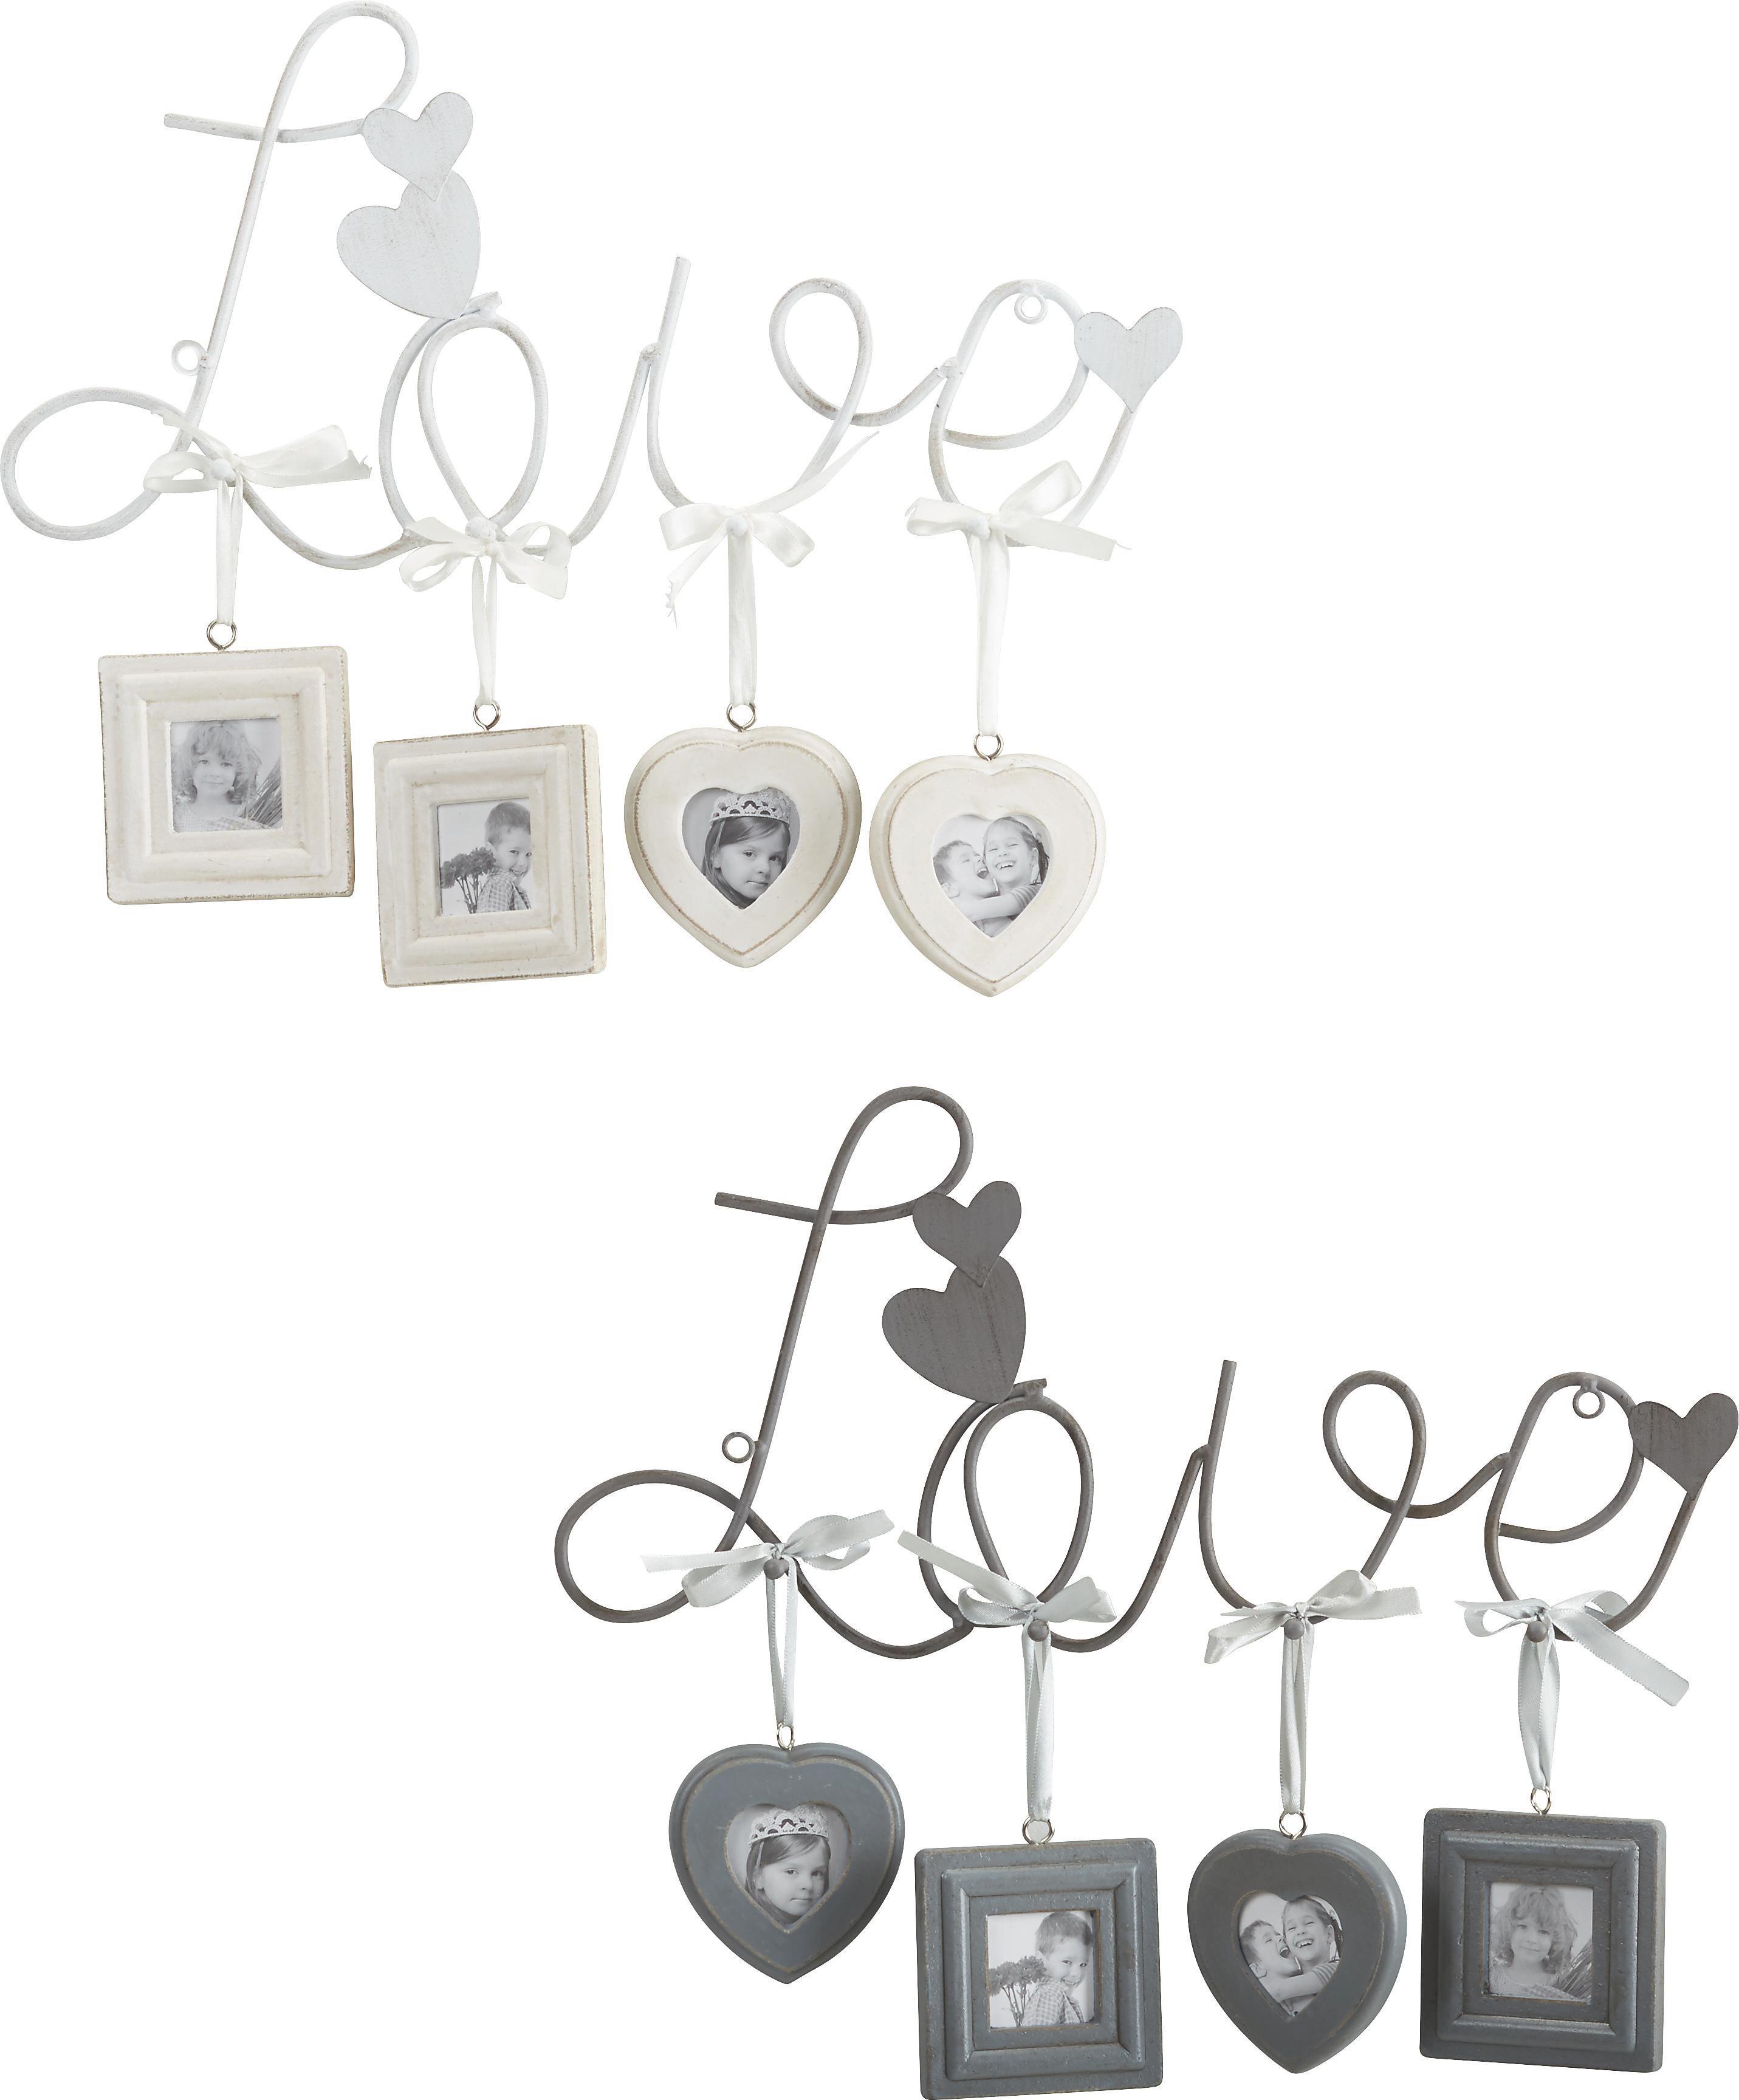 Fotorahmen Love/family, ca. 40x32cm - Weiß/Grau, ROMANTIK / LANDHAUS, Metall (40/32cm) - MÖMAX modern living